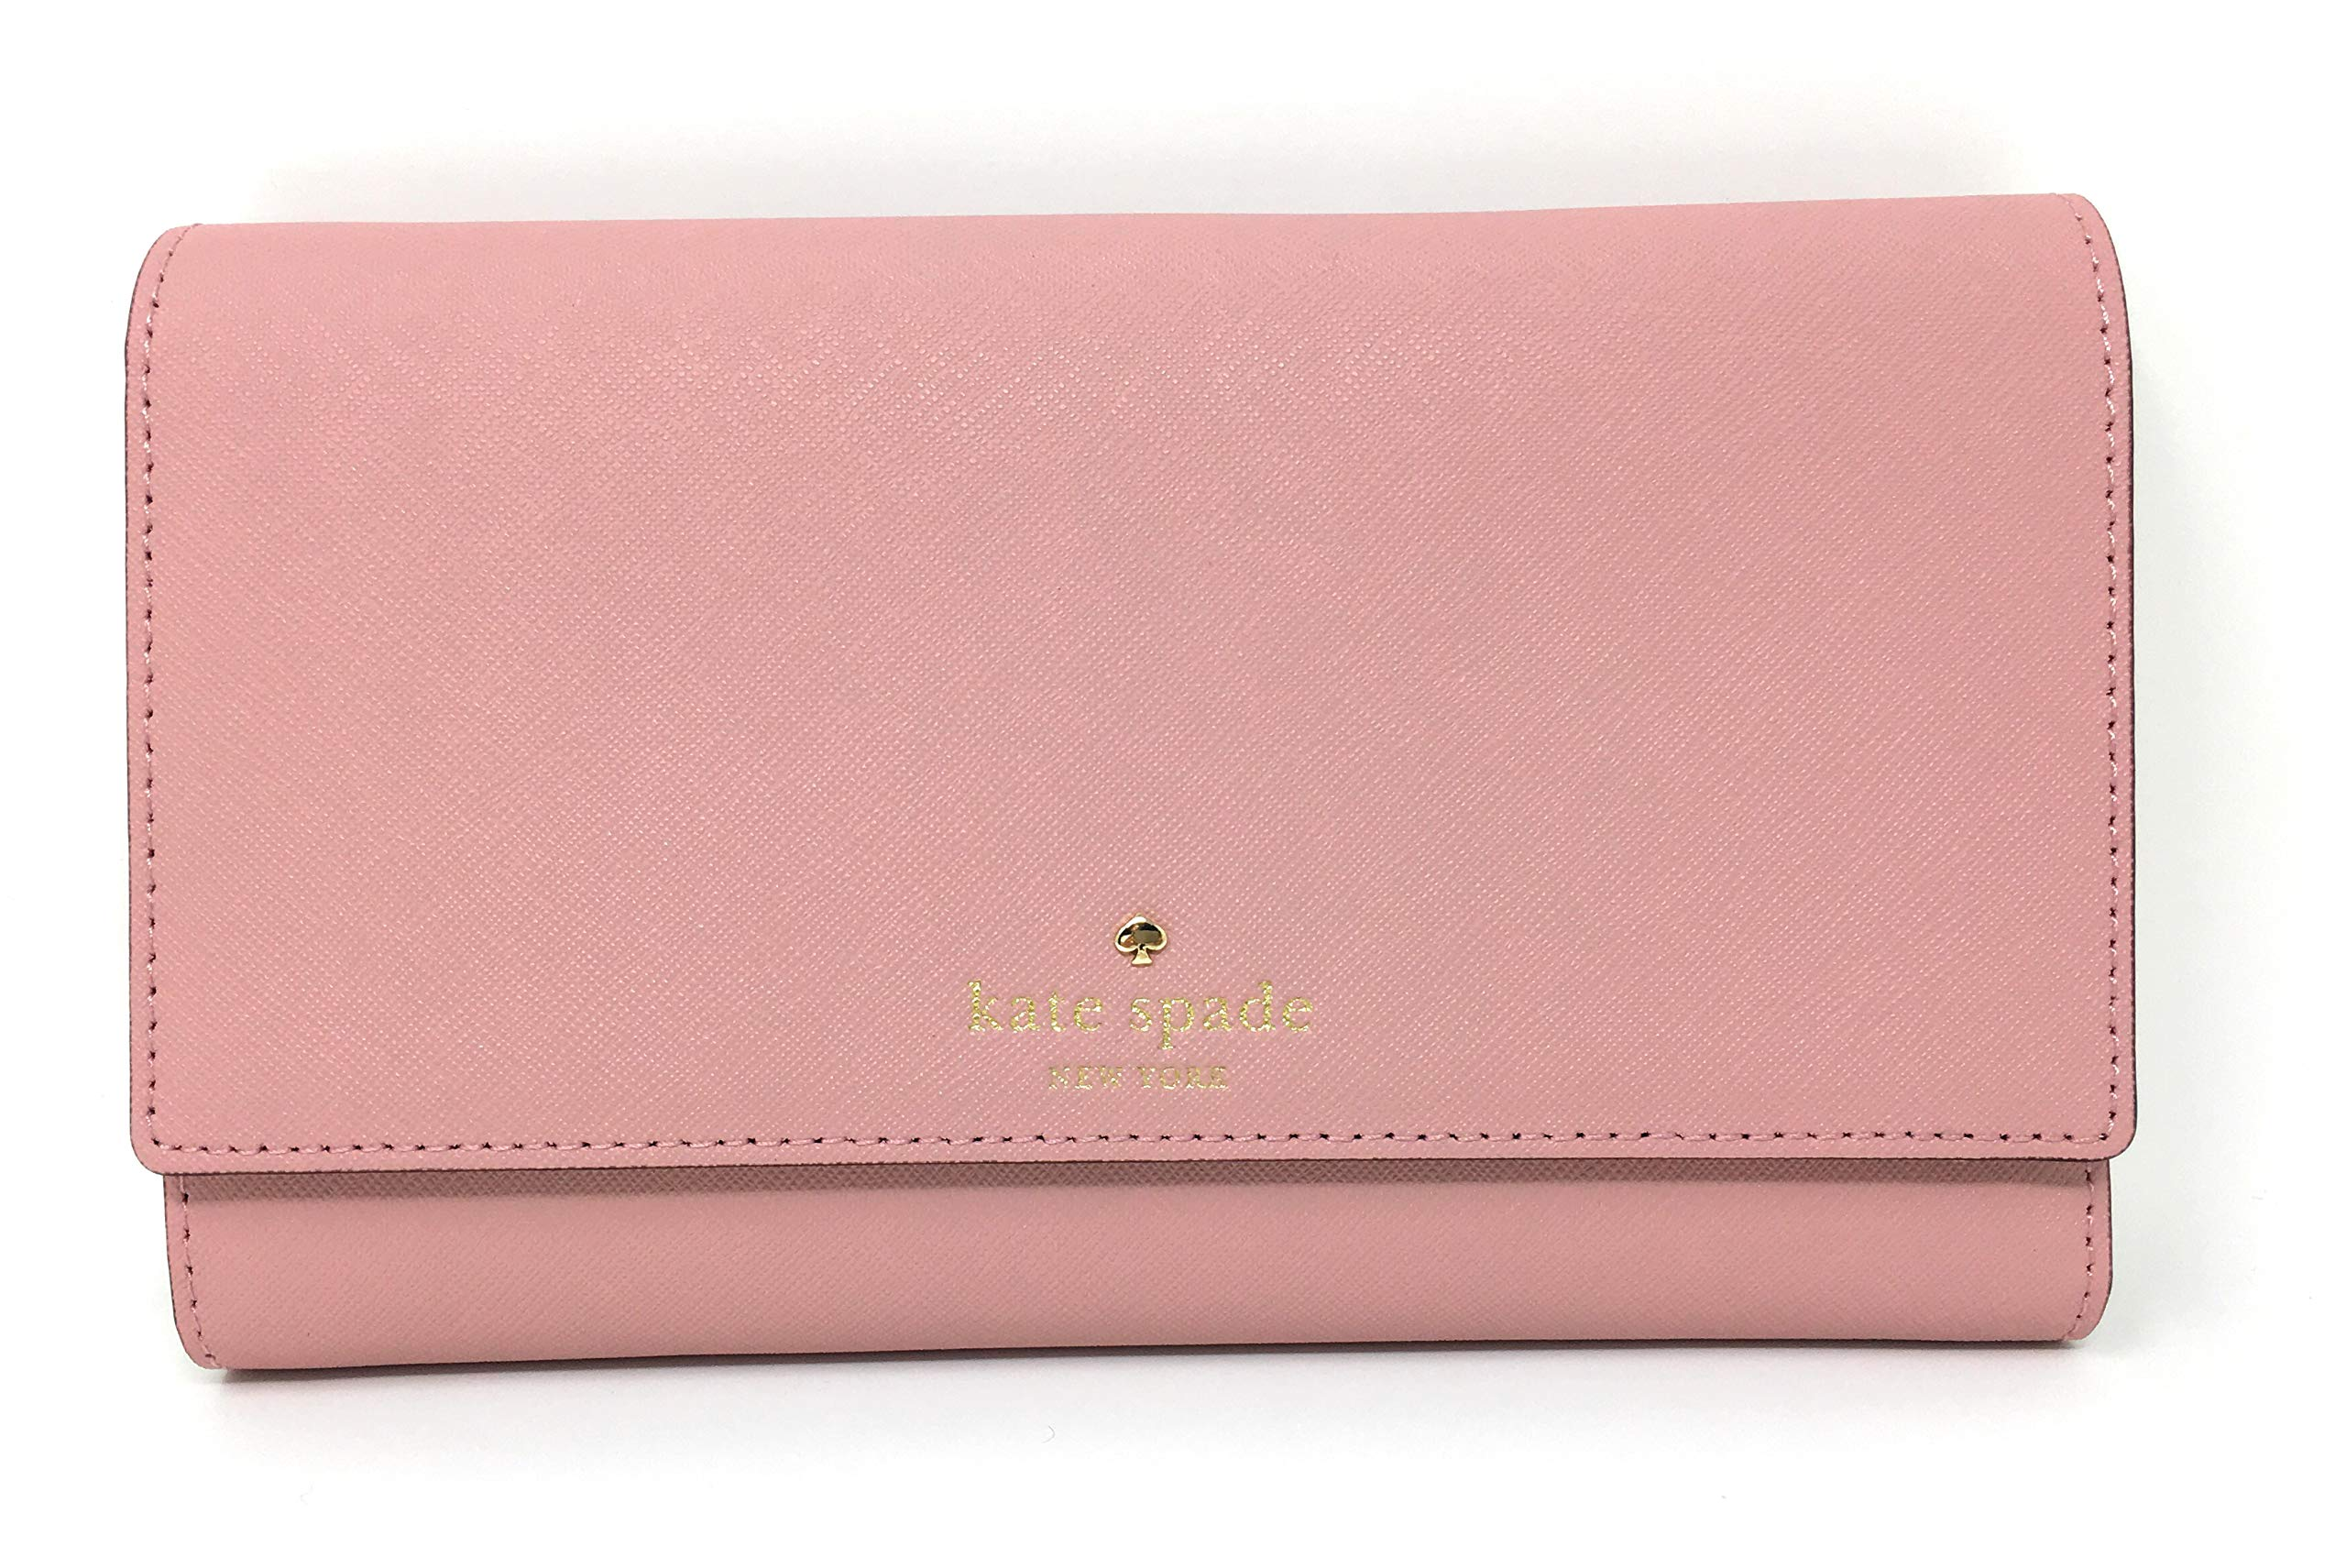 Kate Spade Mikas Pond Phoenix Travel Wallet Trifold Pink Bonnet